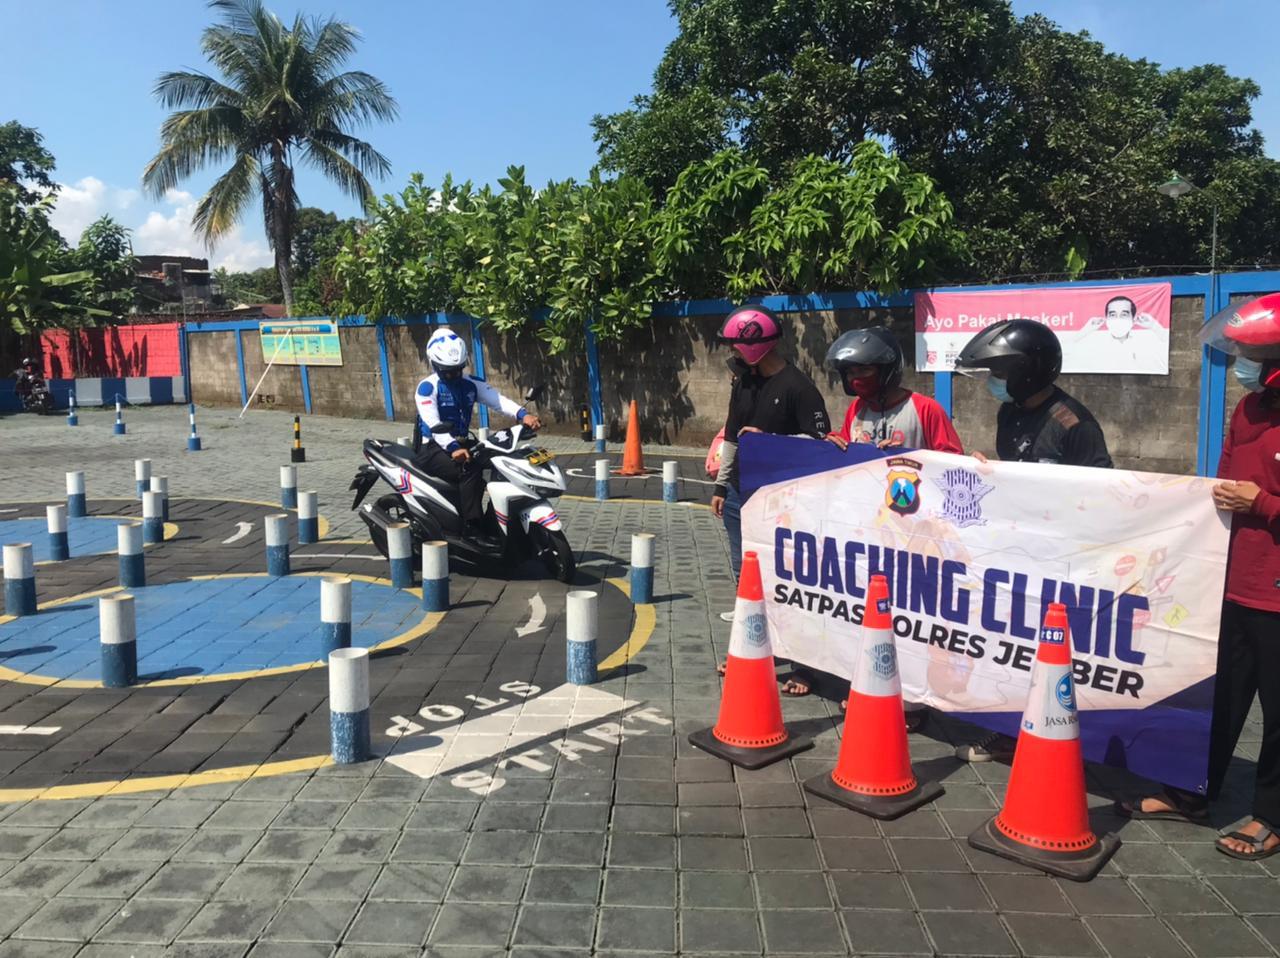 Minimalisir Gagal Uji Praktek SIM, Satlantas Polres Jember Siapkan Coaching Clinic